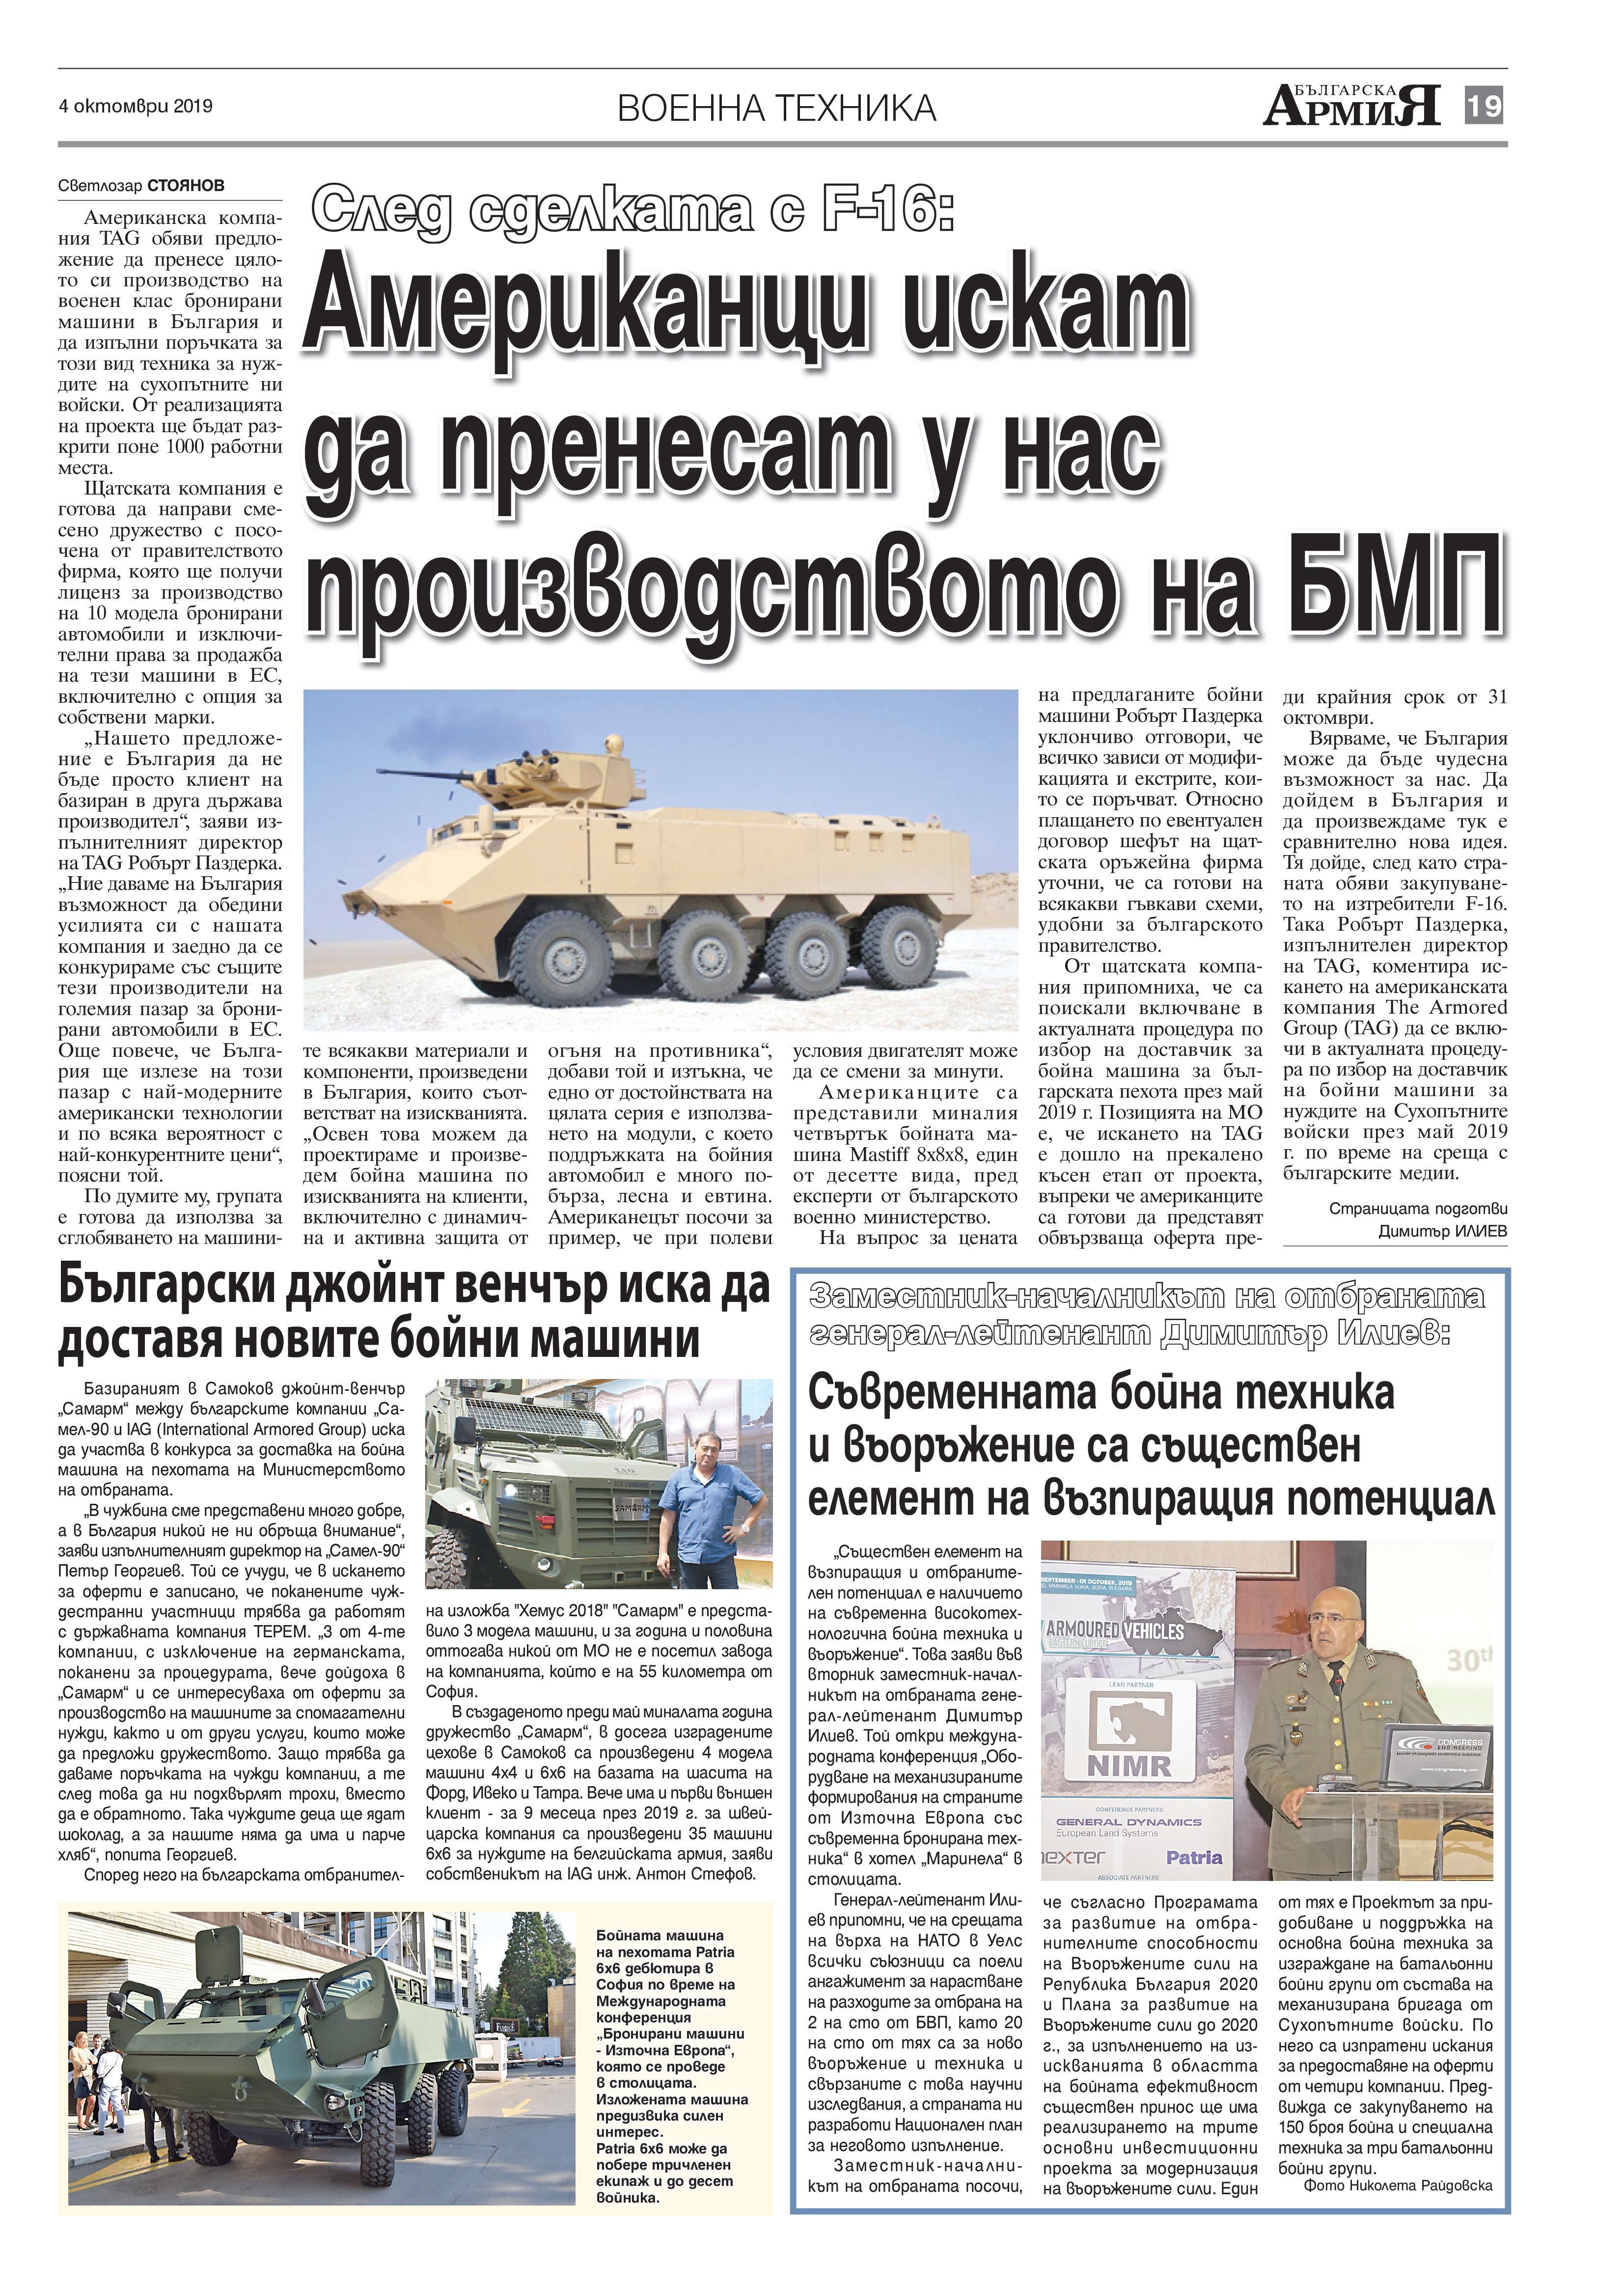 https://www.armymedia.bg/wp-content/uploads/2015/06/19-33.jpg